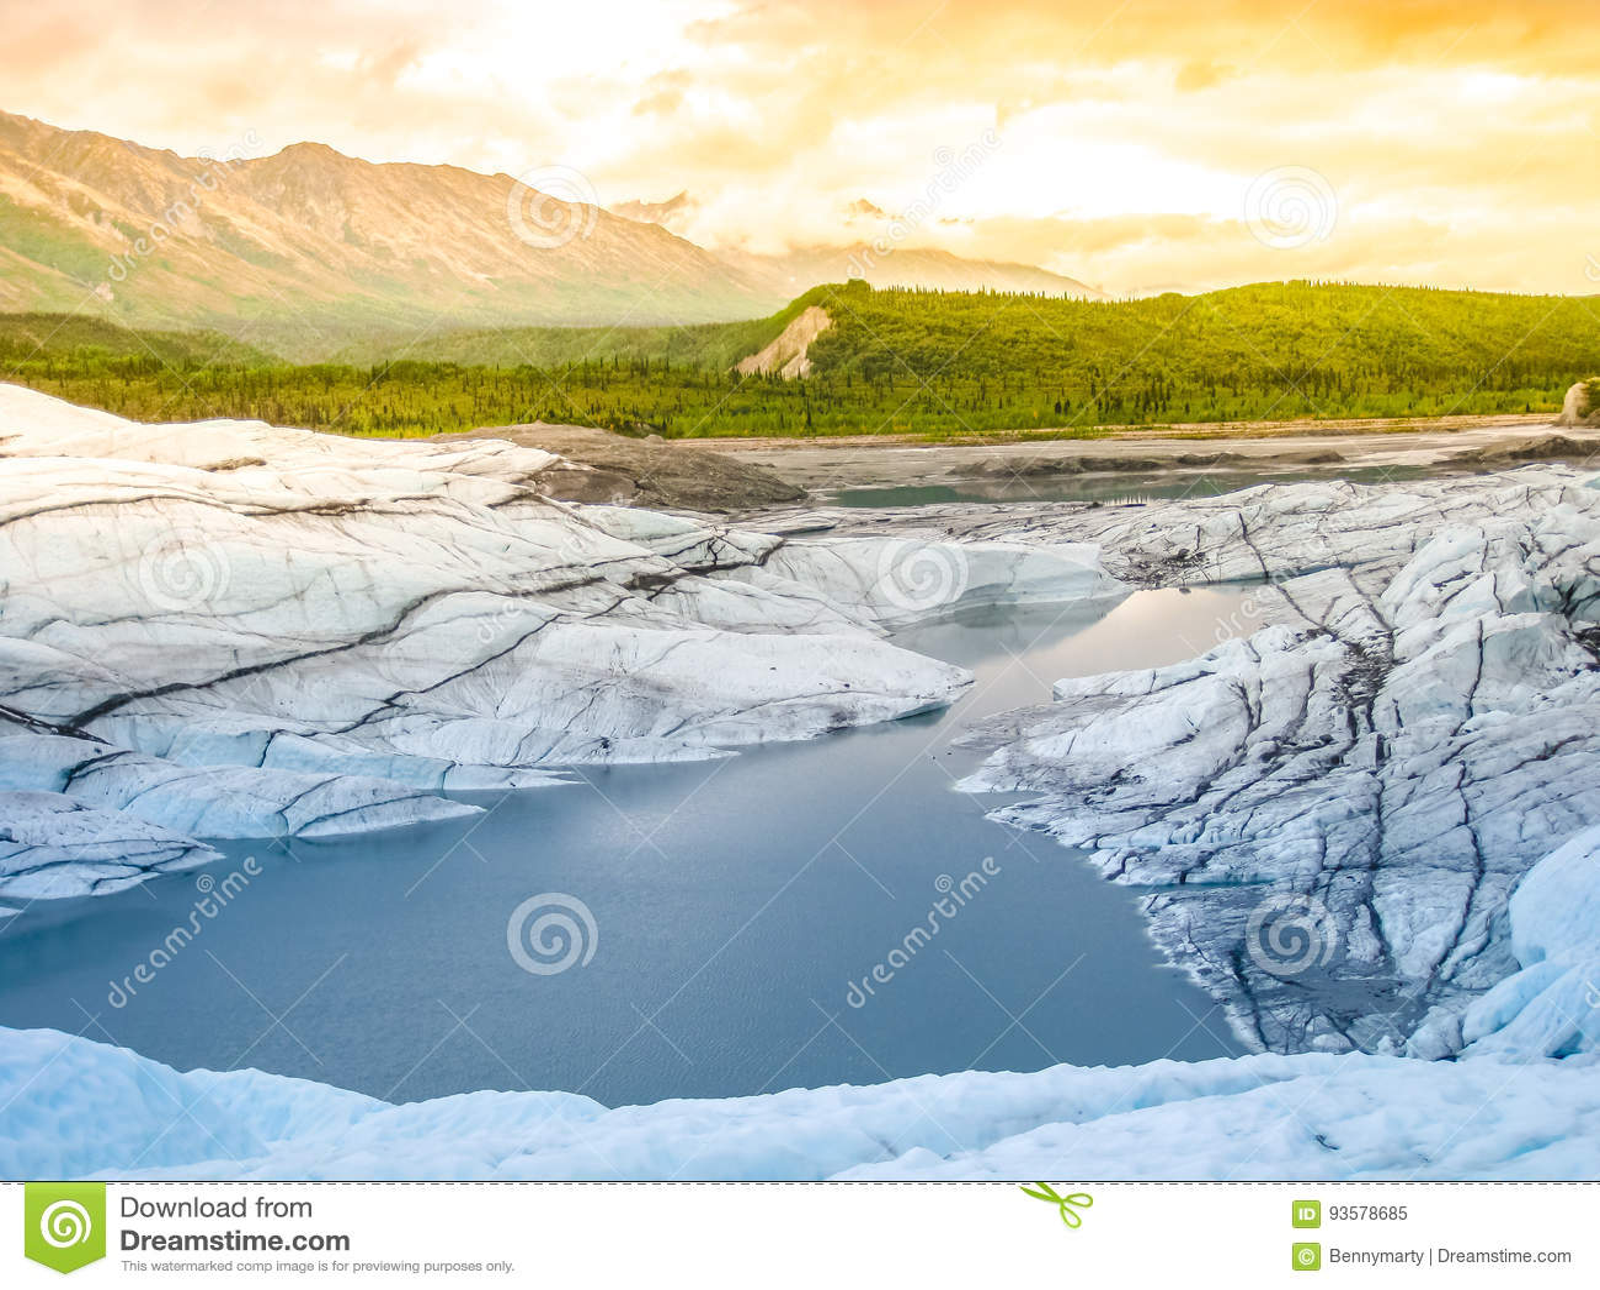 Matanuska Glacier melting